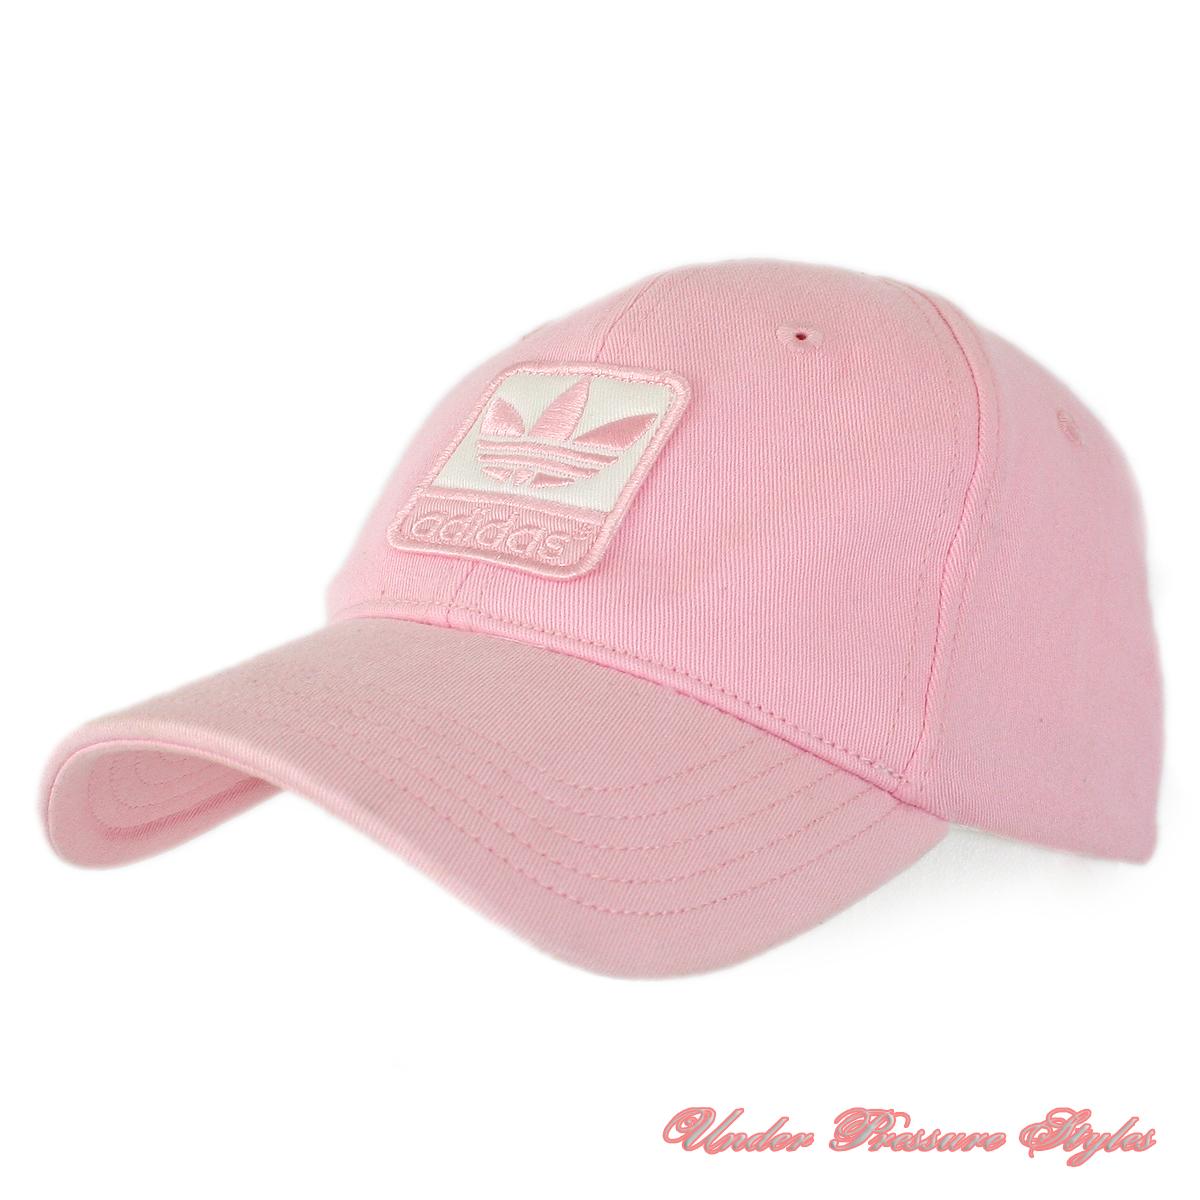 adidas cap rosa flexfit wei m tze cappy kappe basecap. Black Bedroom Furniture Sets. Home Design Ideas